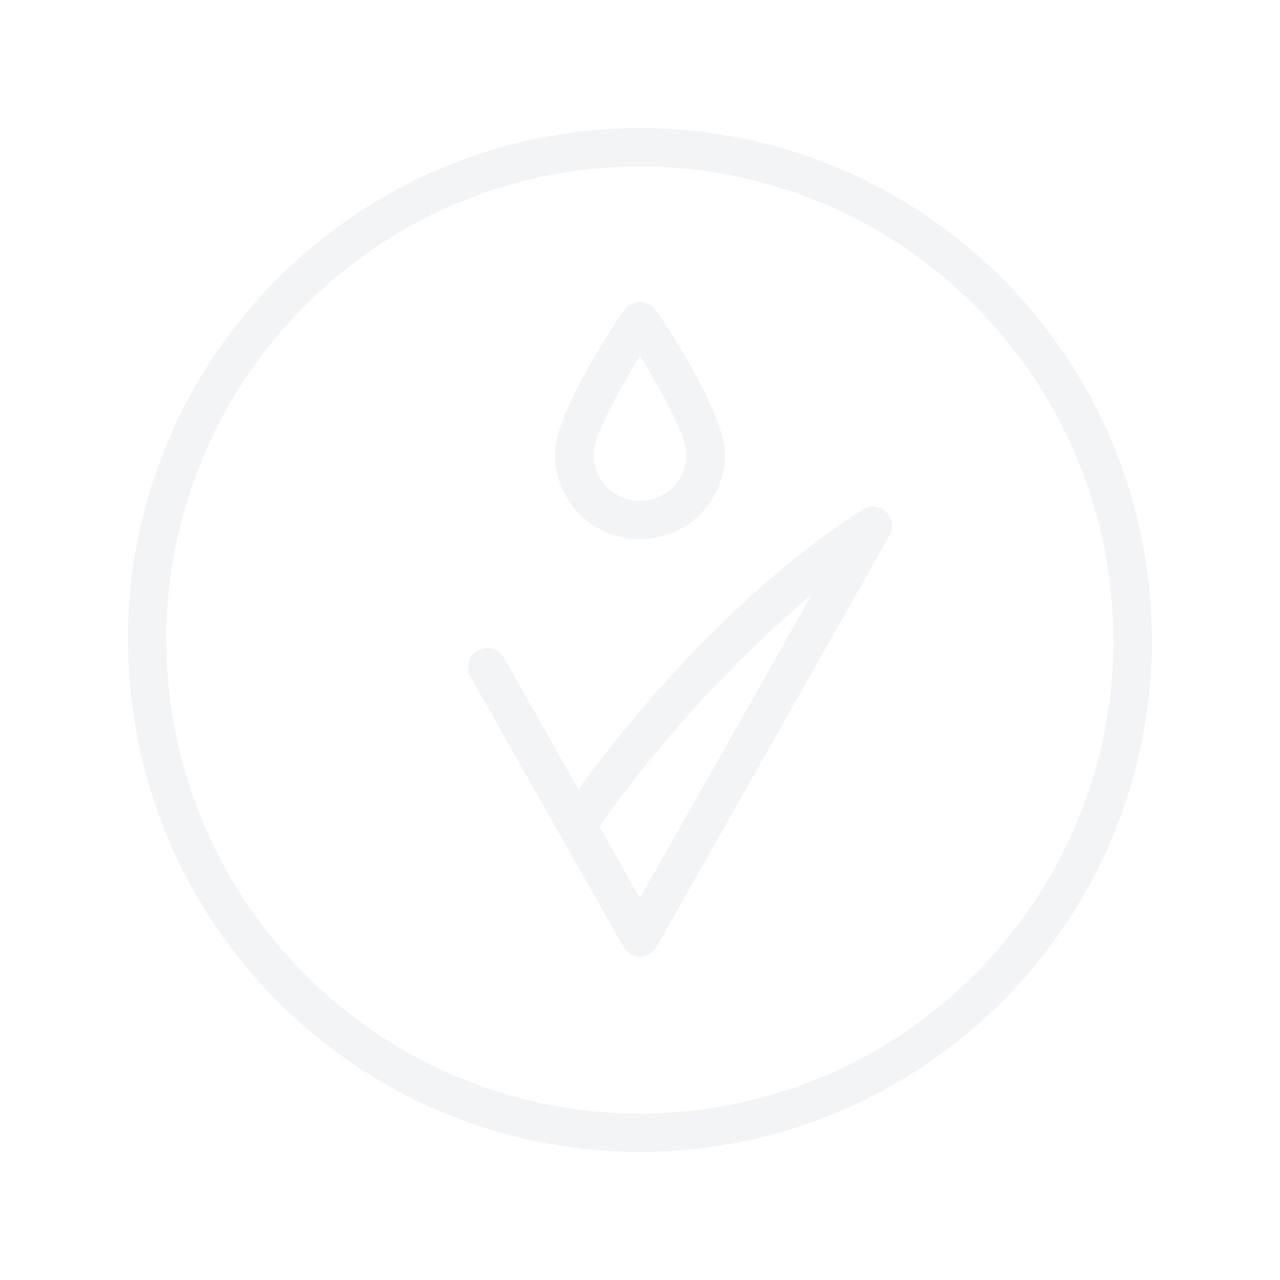 ENLIGHTEN Serum Toothpaste 75ml